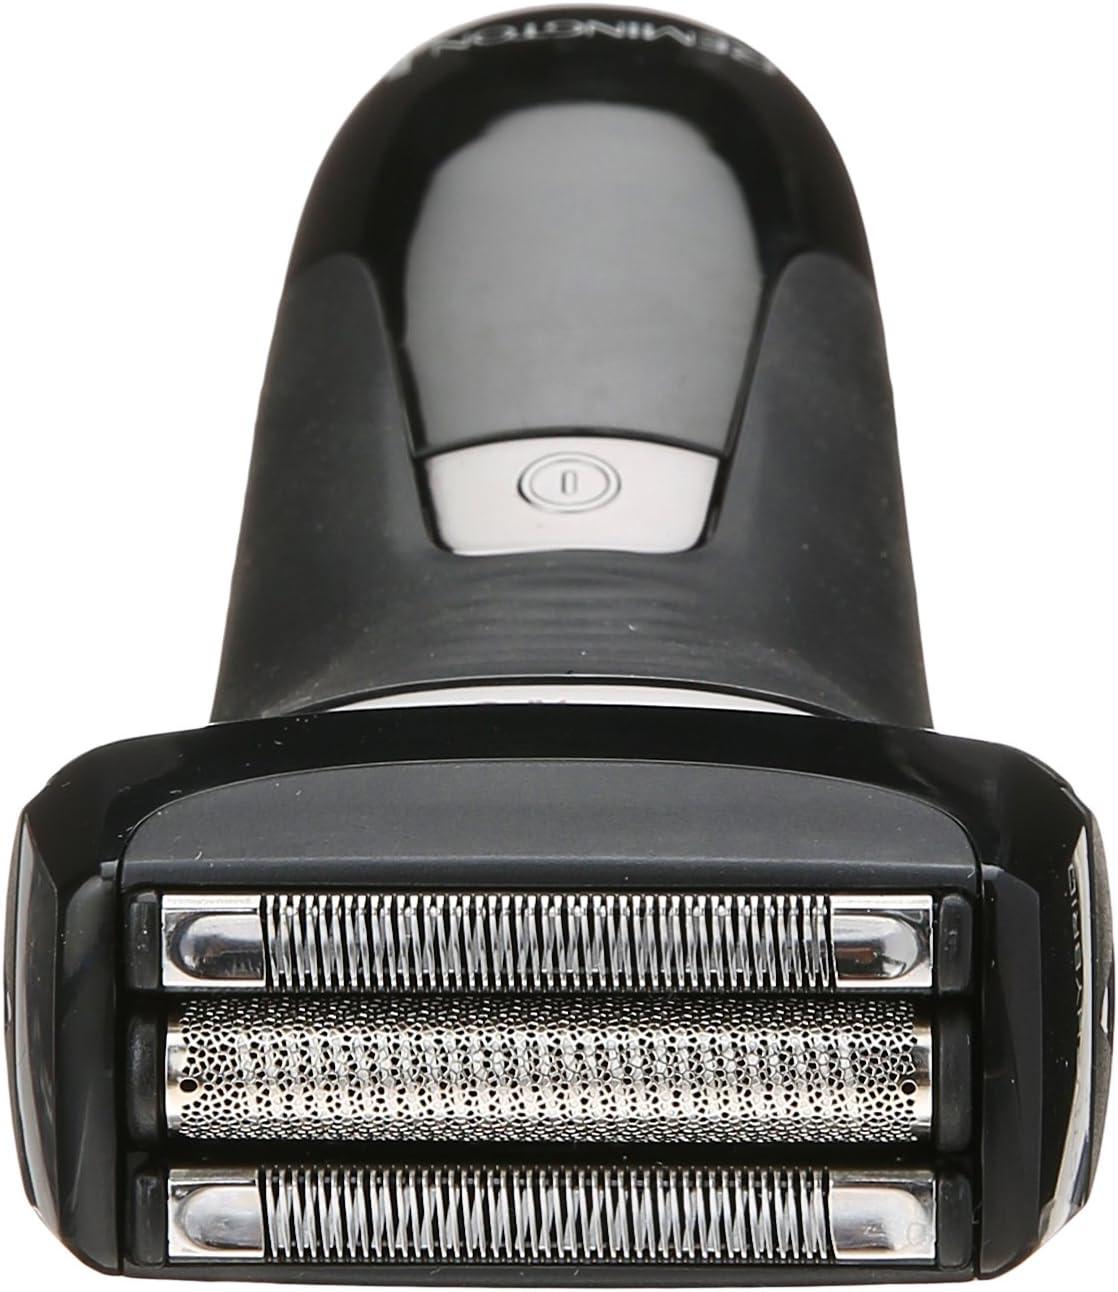 Remington XF8700 Remington XF8550 - Afeitadora eléctrica para hombre, , , Negro, 1 uds. por paquete, 1[set de ]: Amazon.es: Belleza